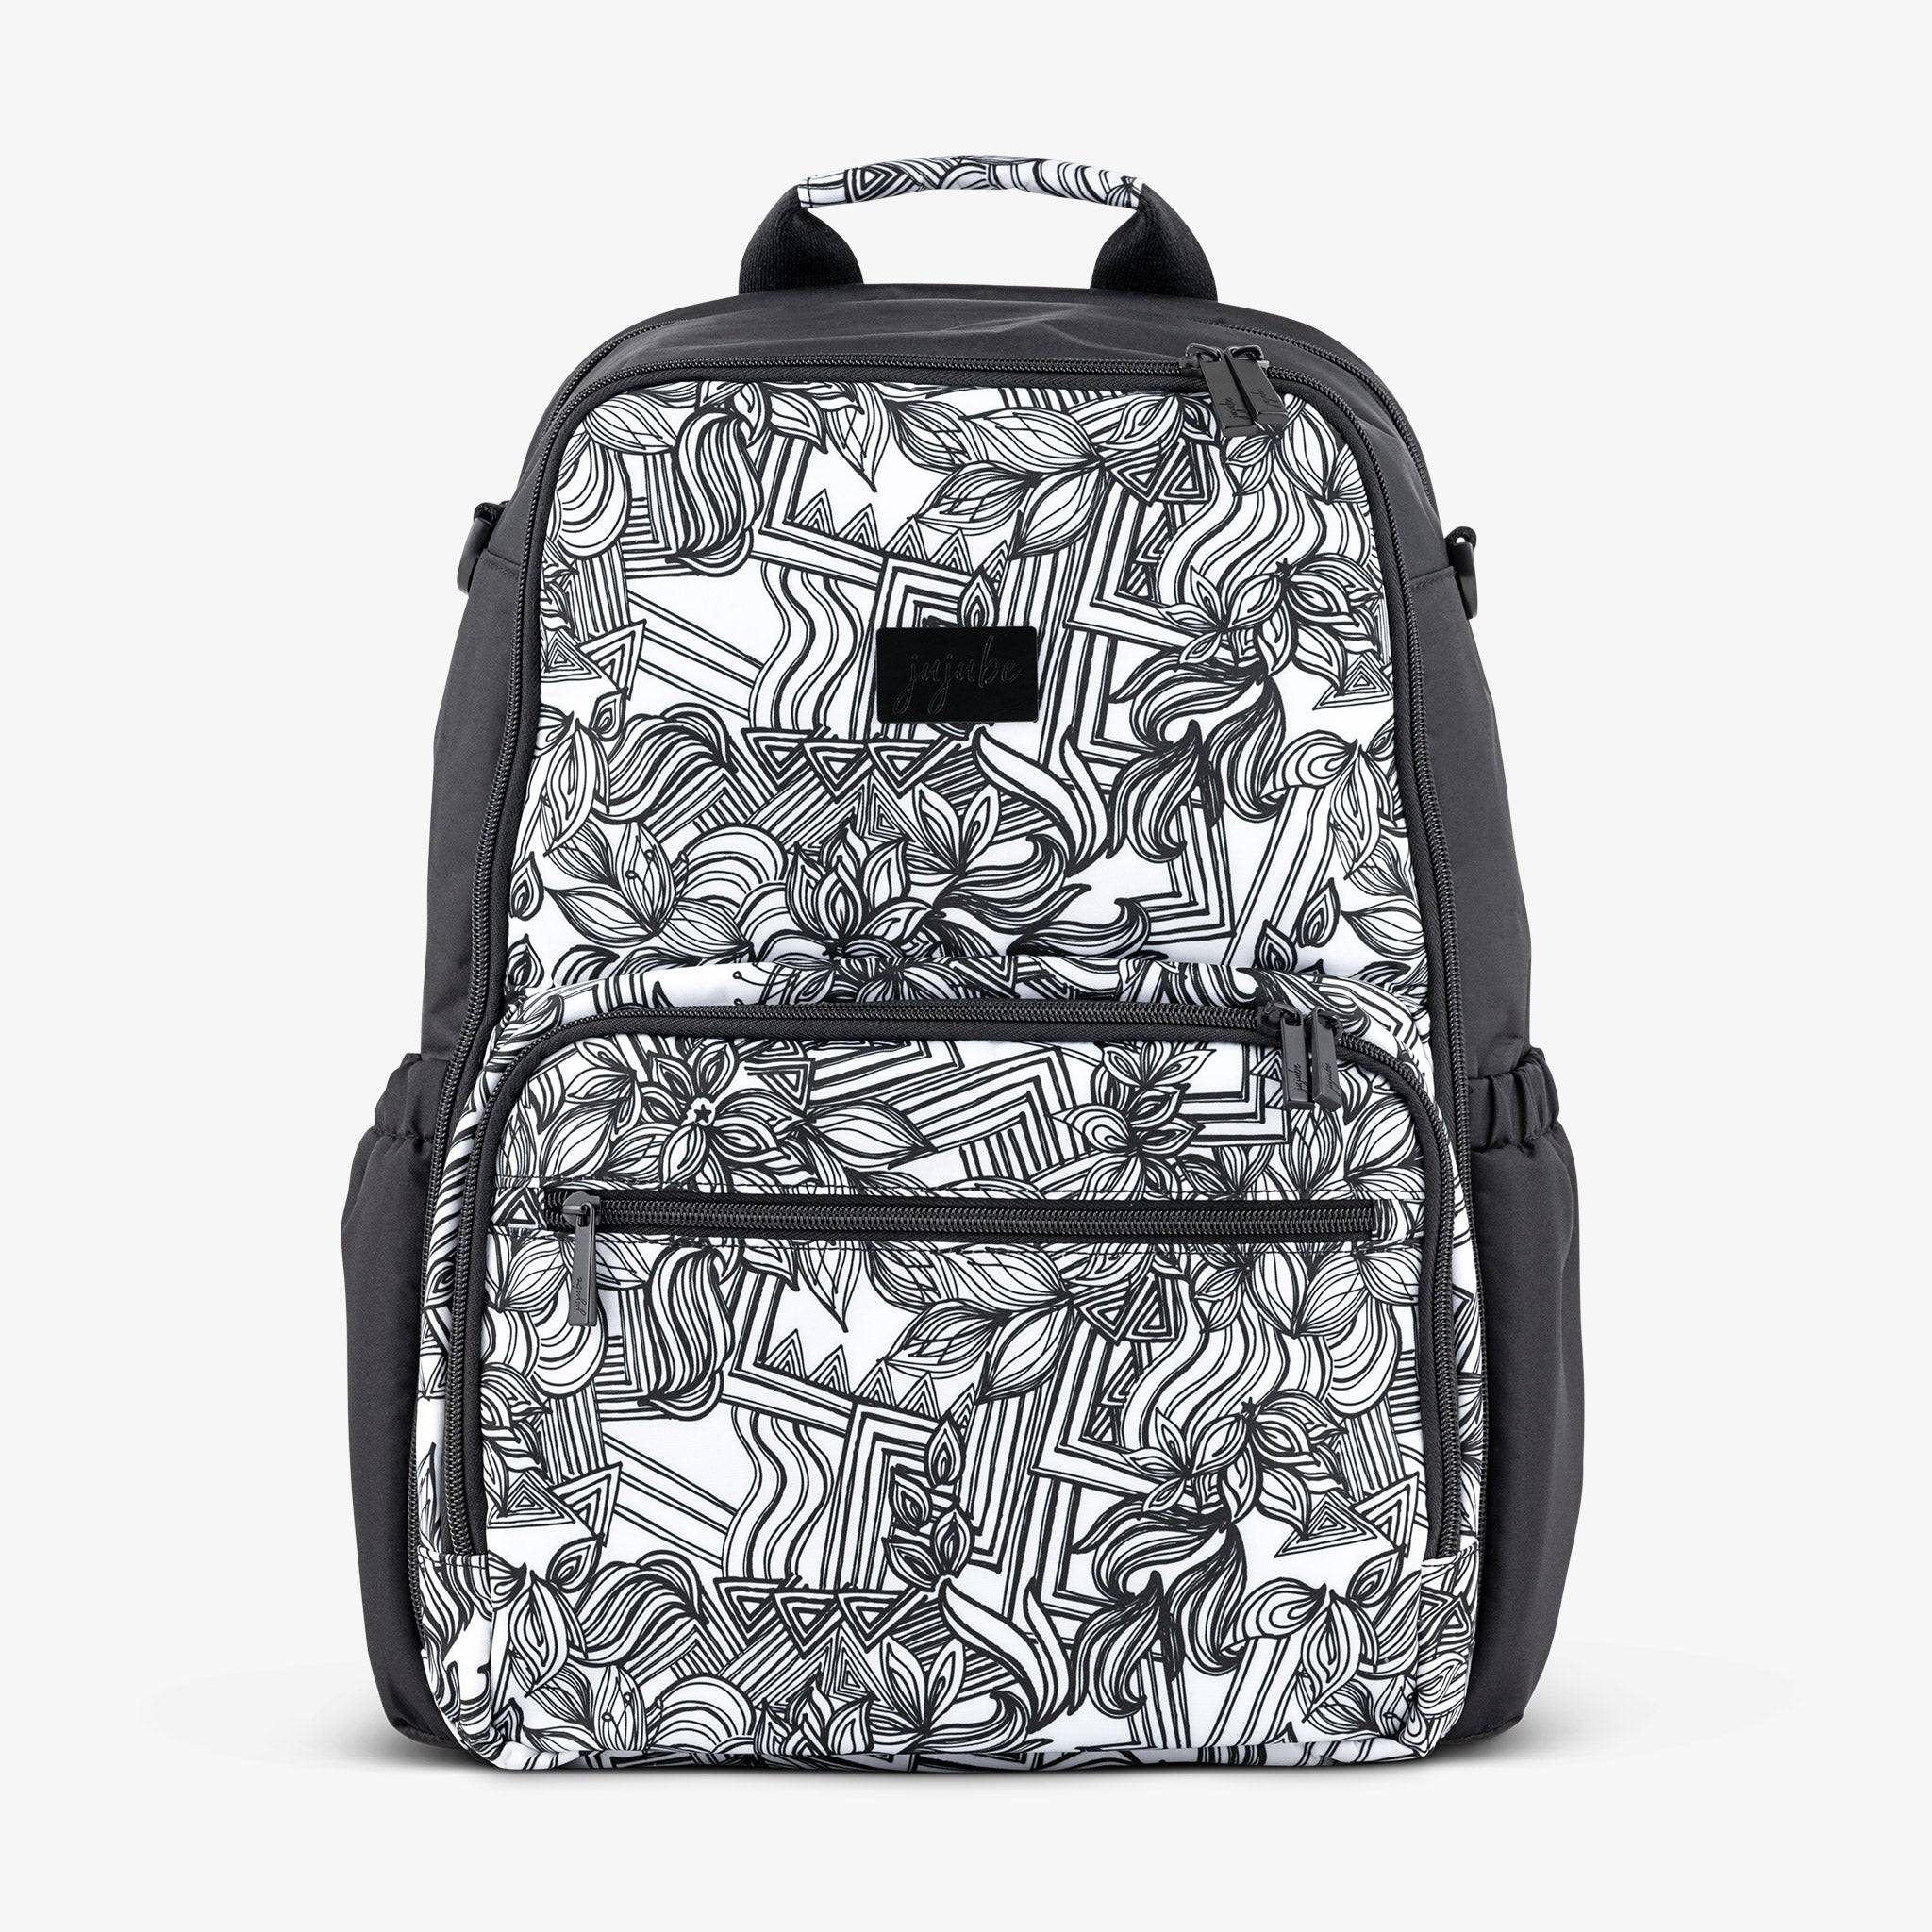 JuJuBe Zealous Backpack - Sketch